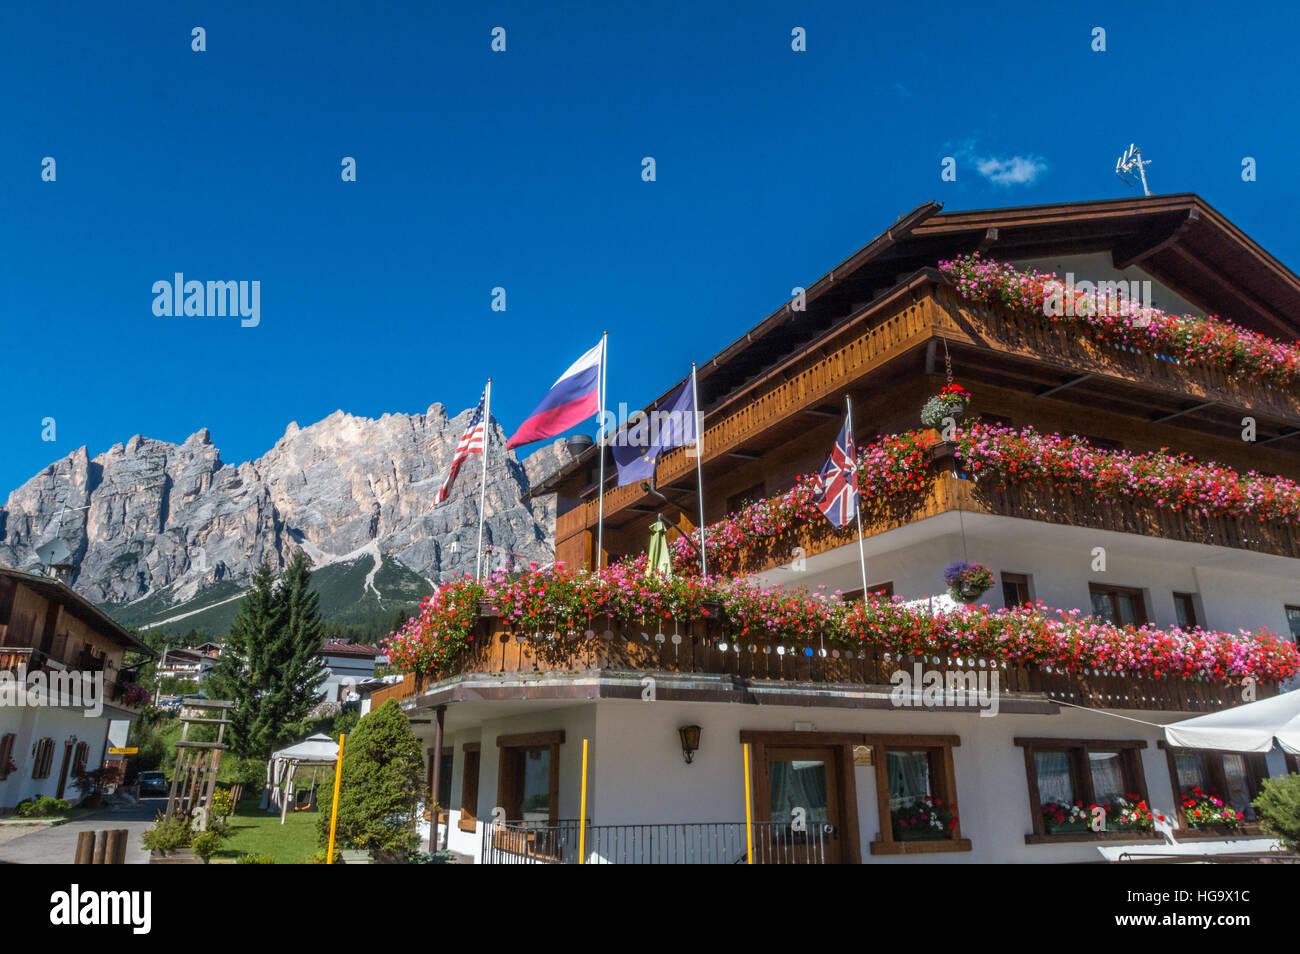 Cortina d'Ampezzo in Italy - Stock Image